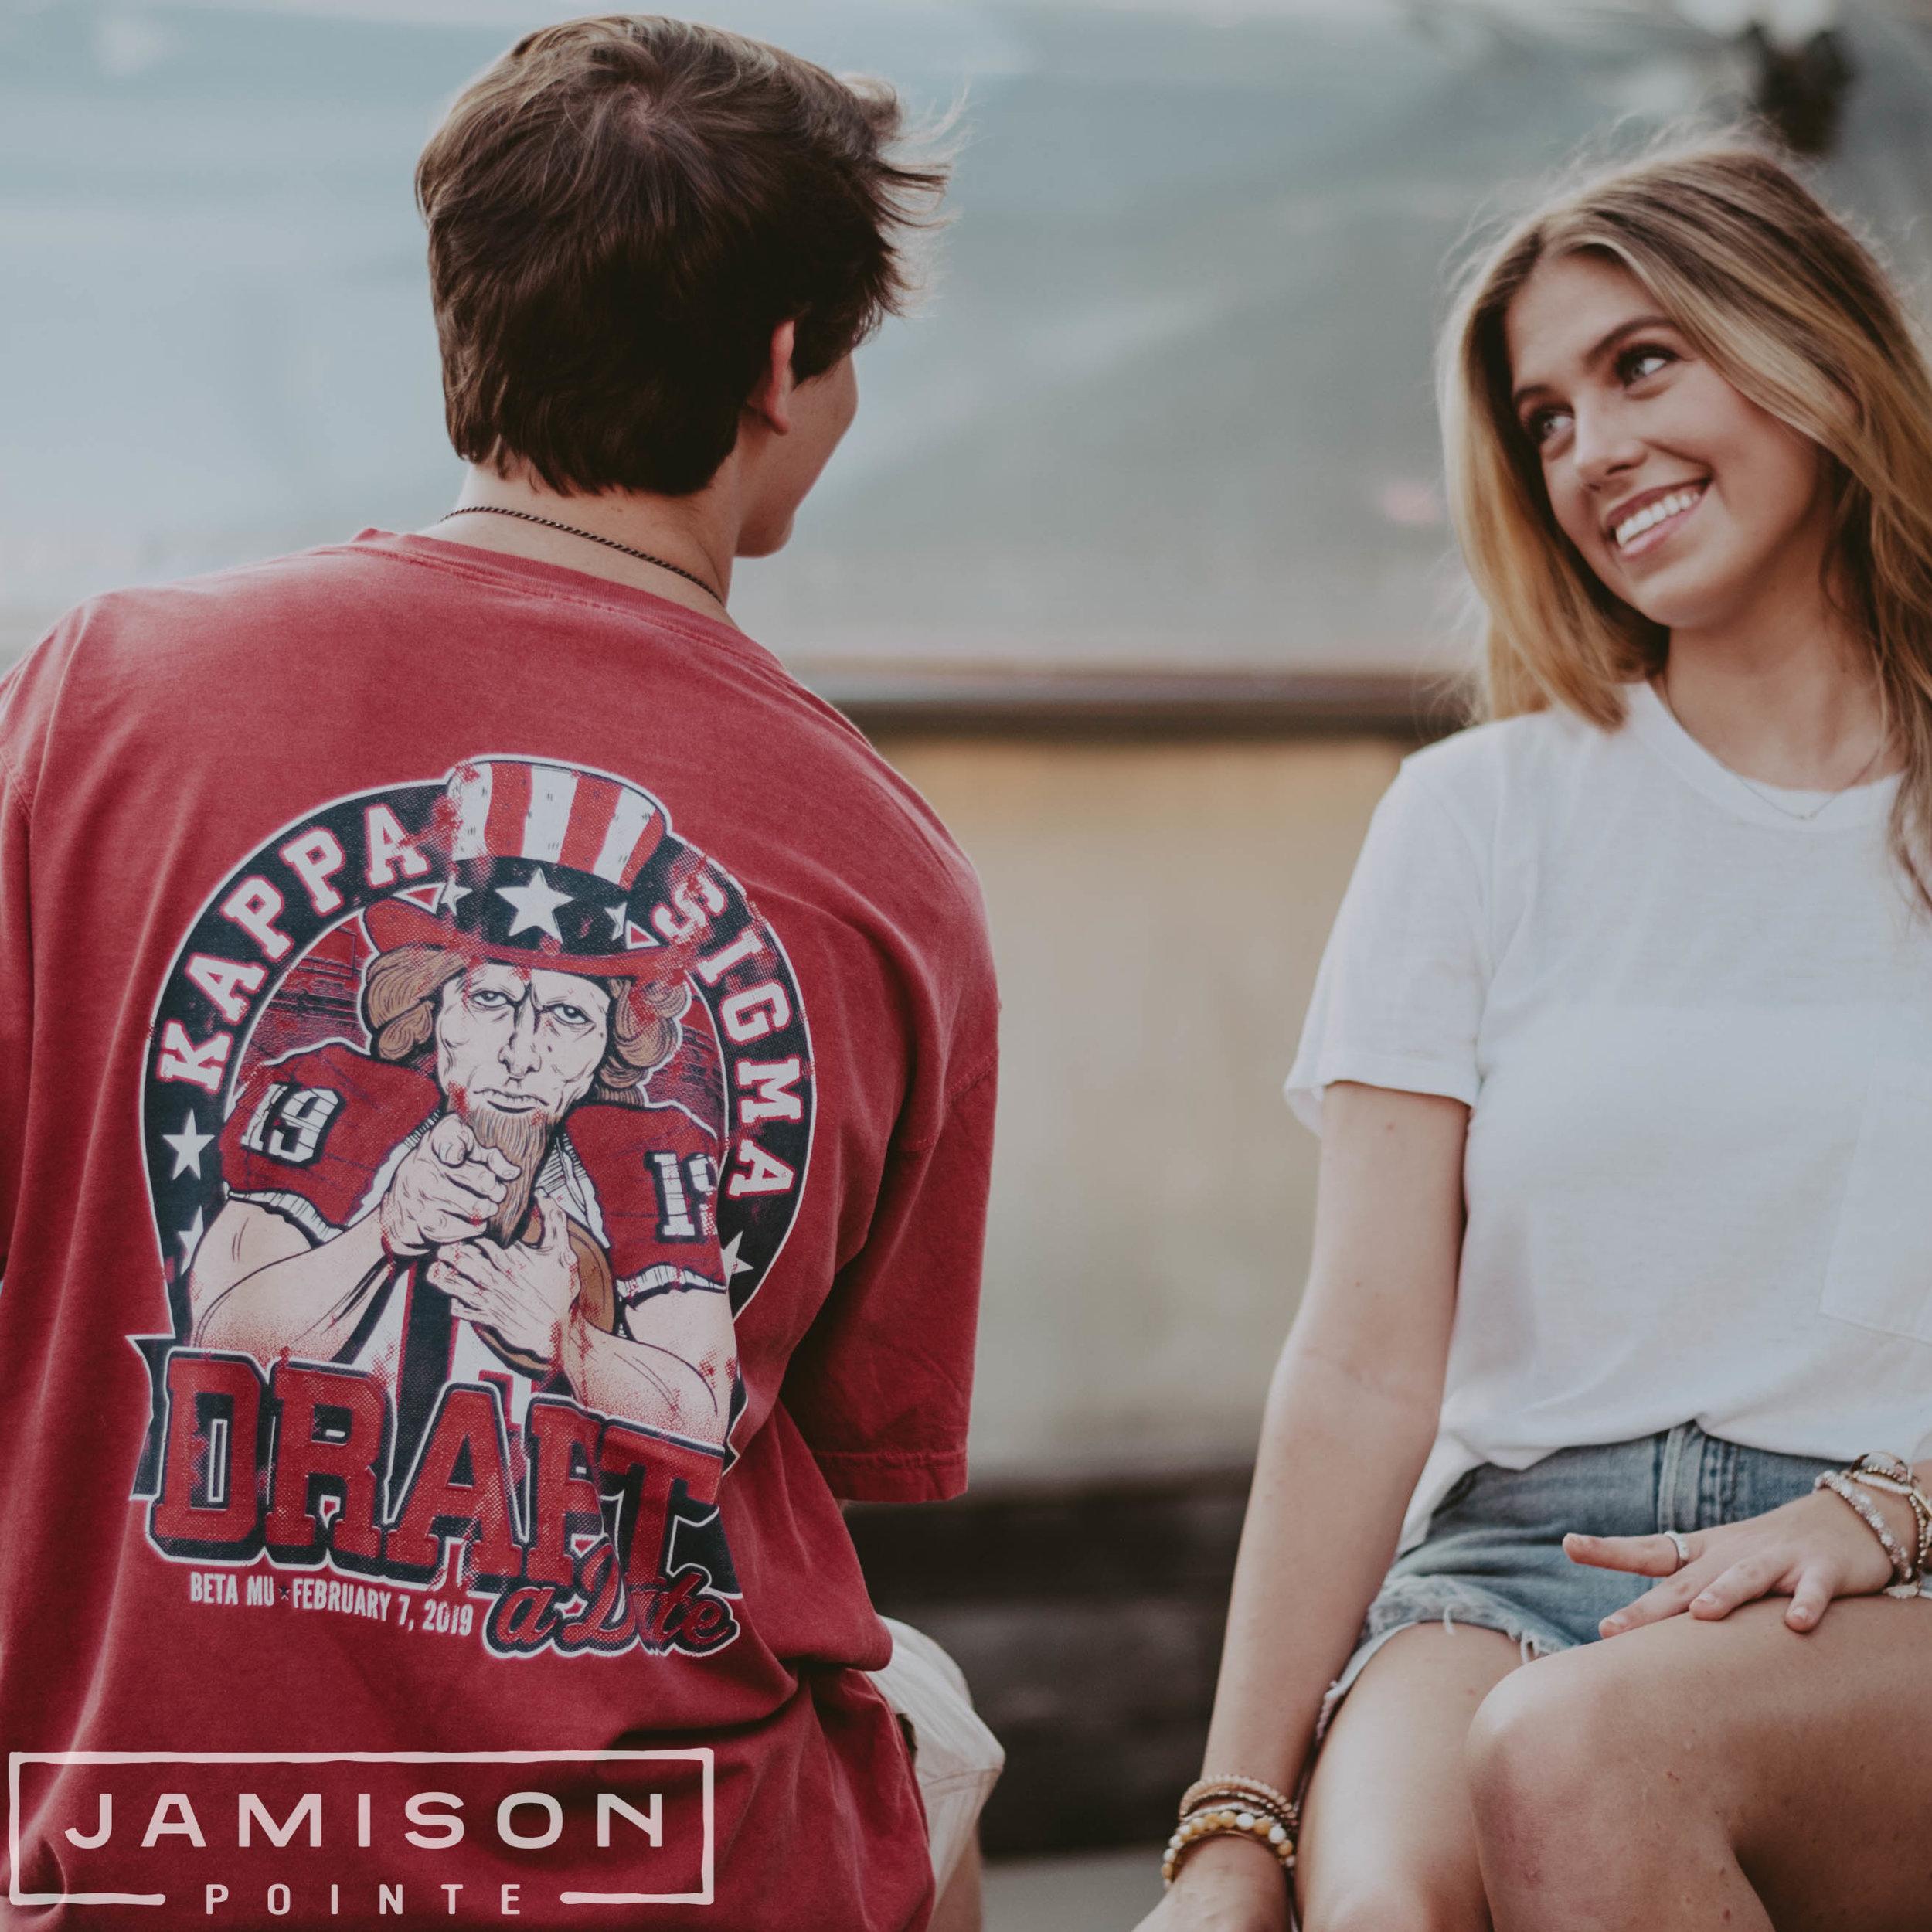 Kappa Sigma Draft A Date Tshirt